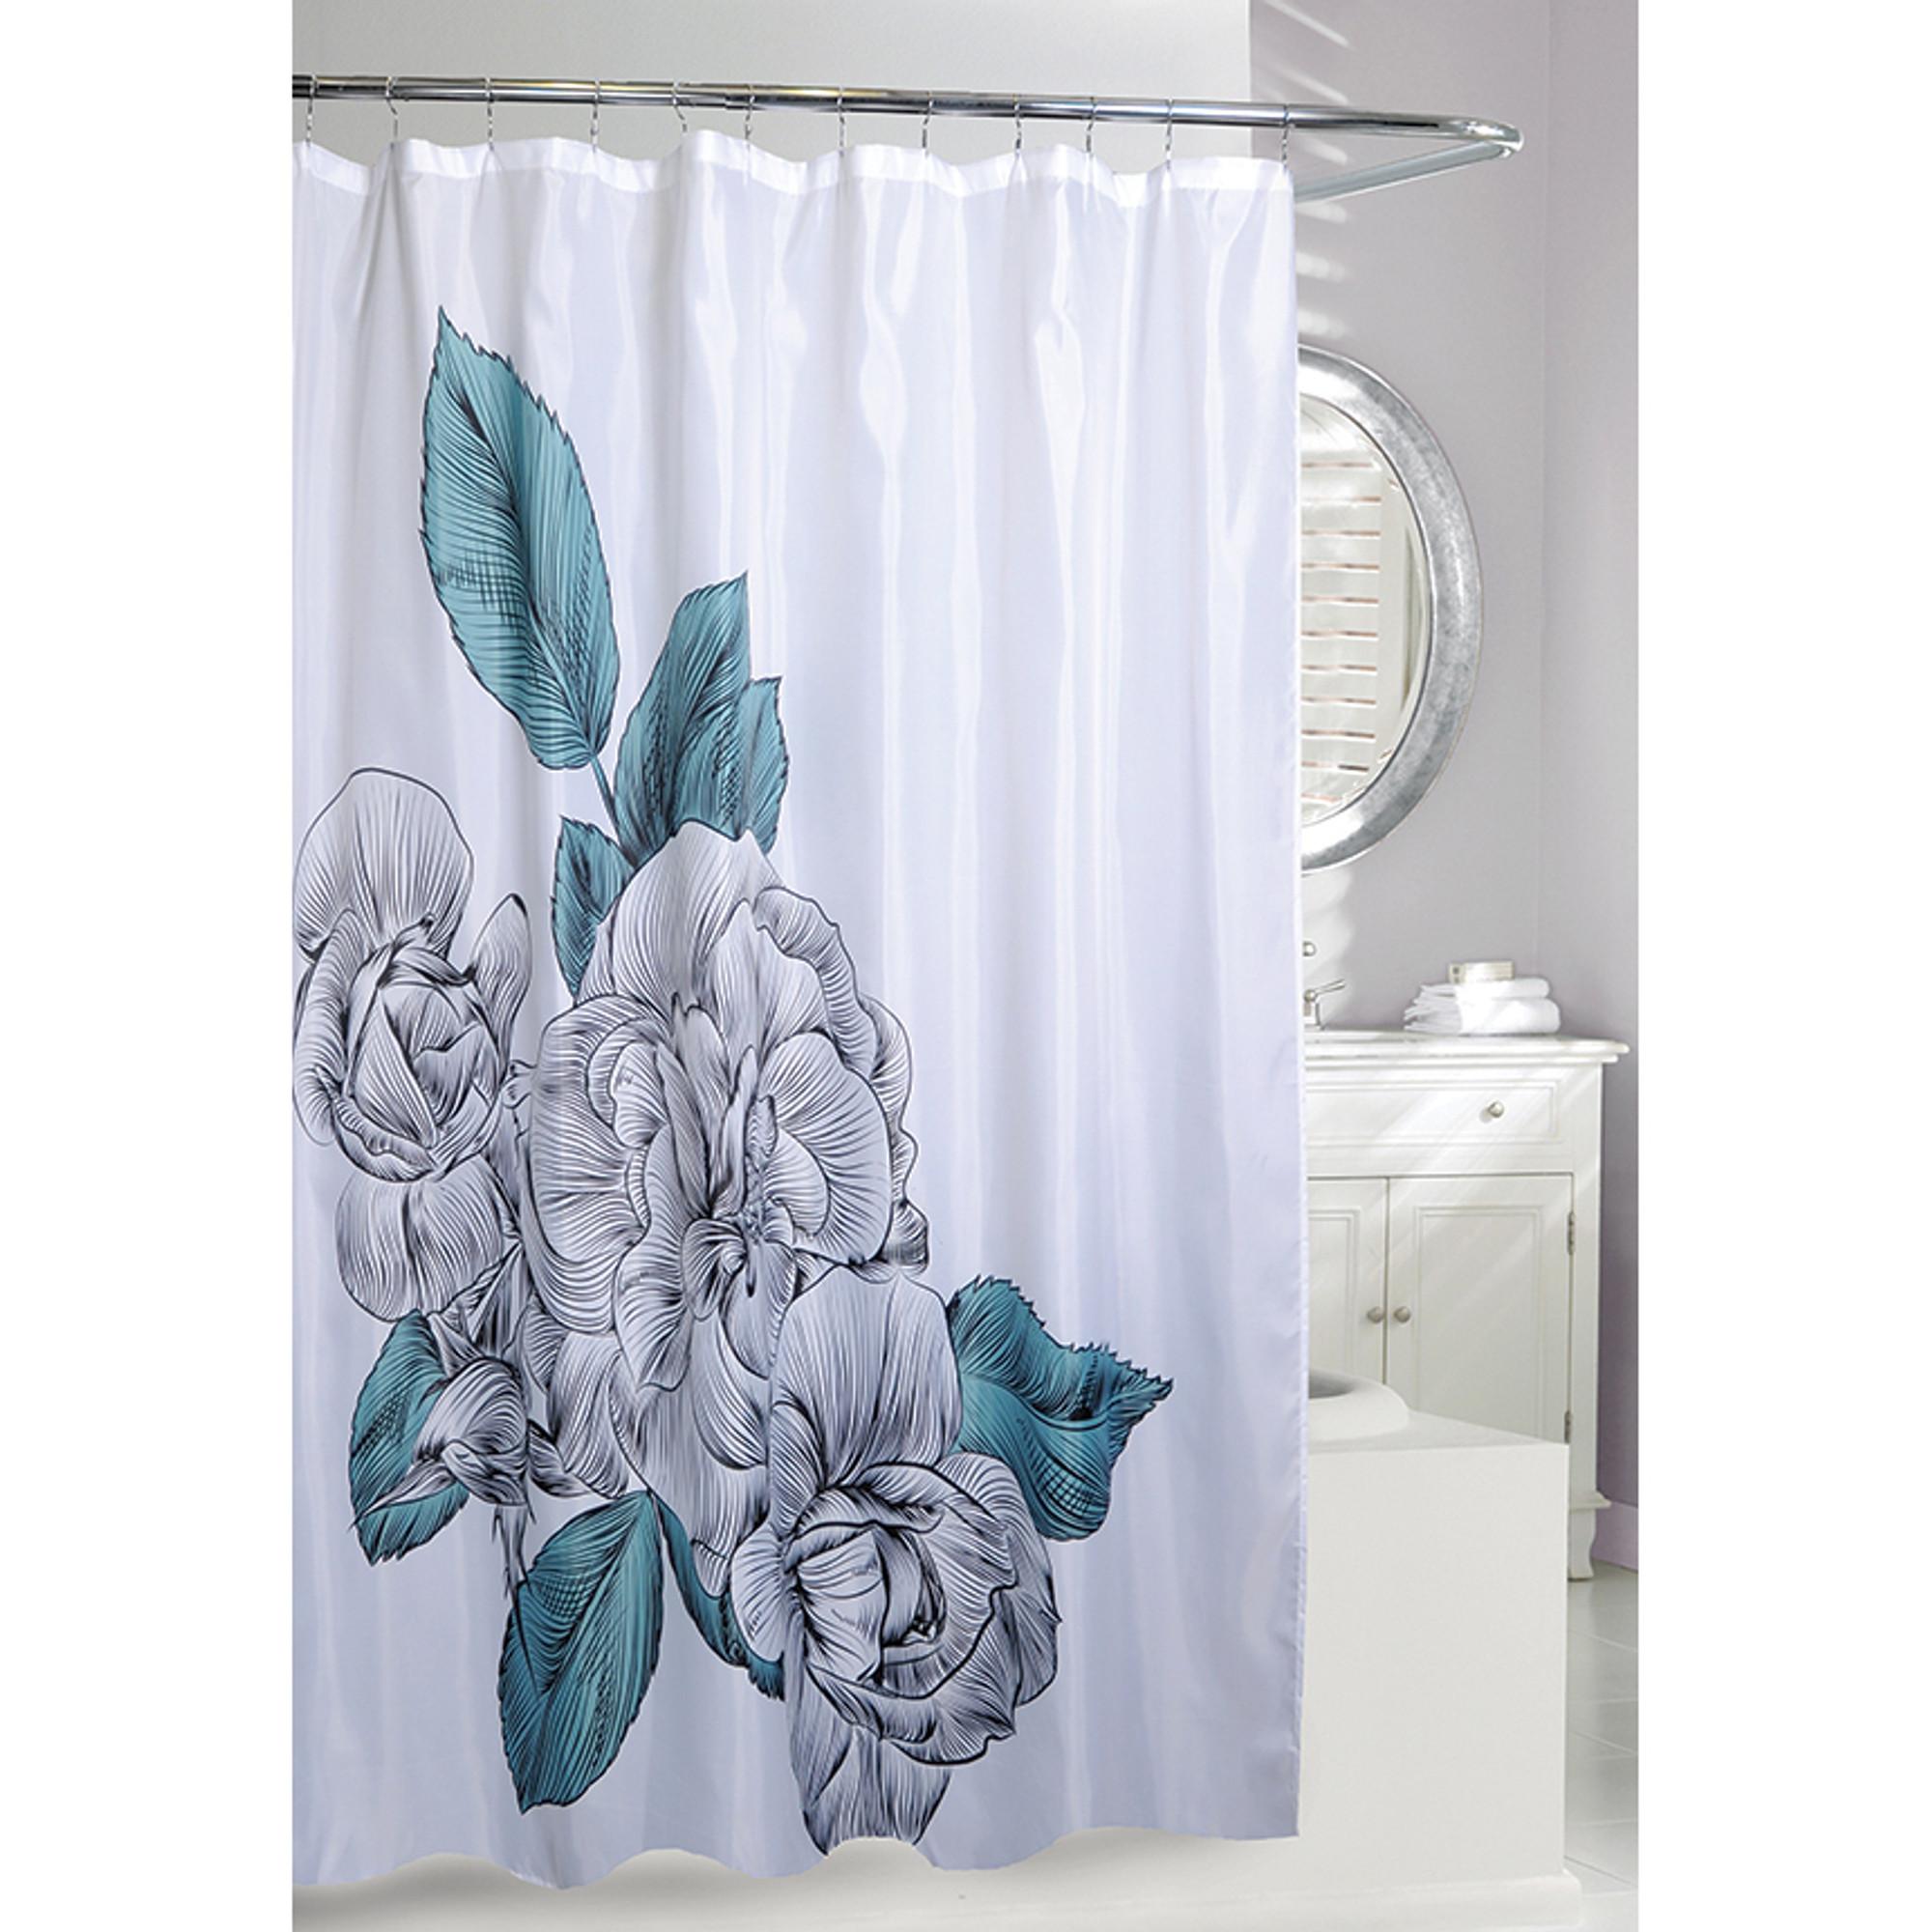 flower fabric shower curtain blue sketch floral